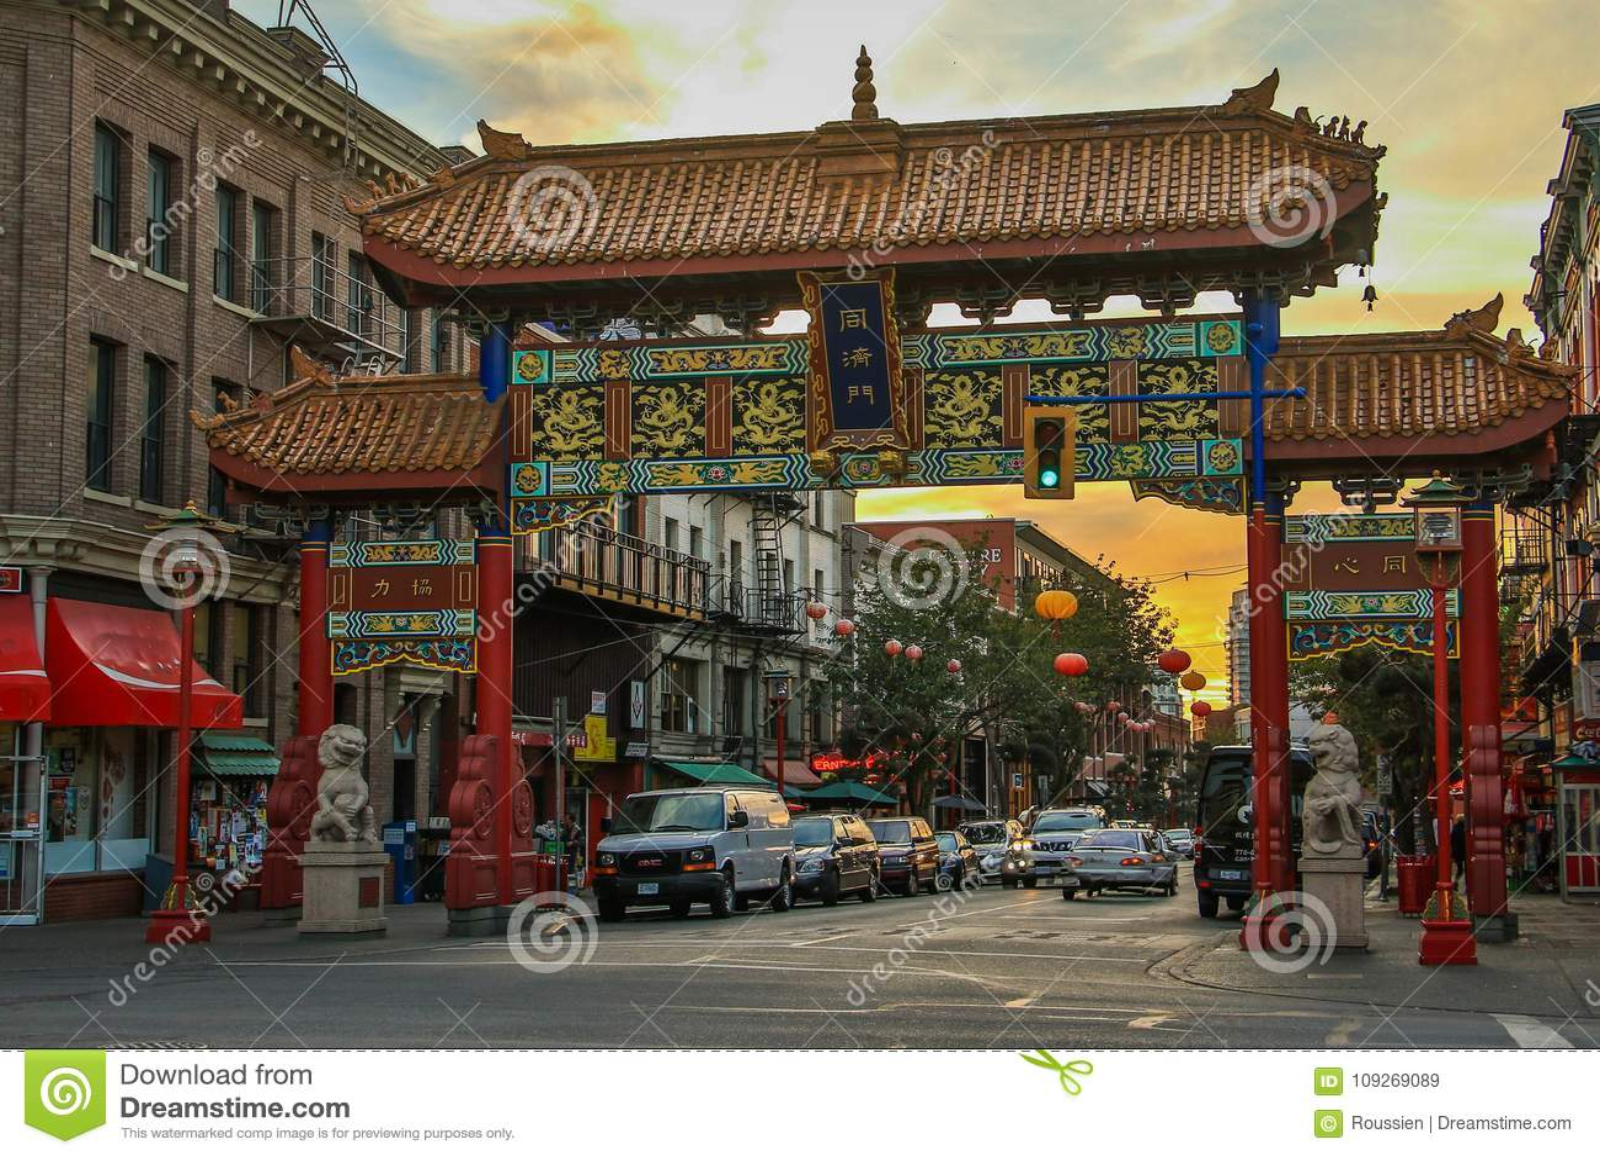 Chinatown στην πόλη Βικτώριας, Νησί Βανκούβερ, Καναδάς